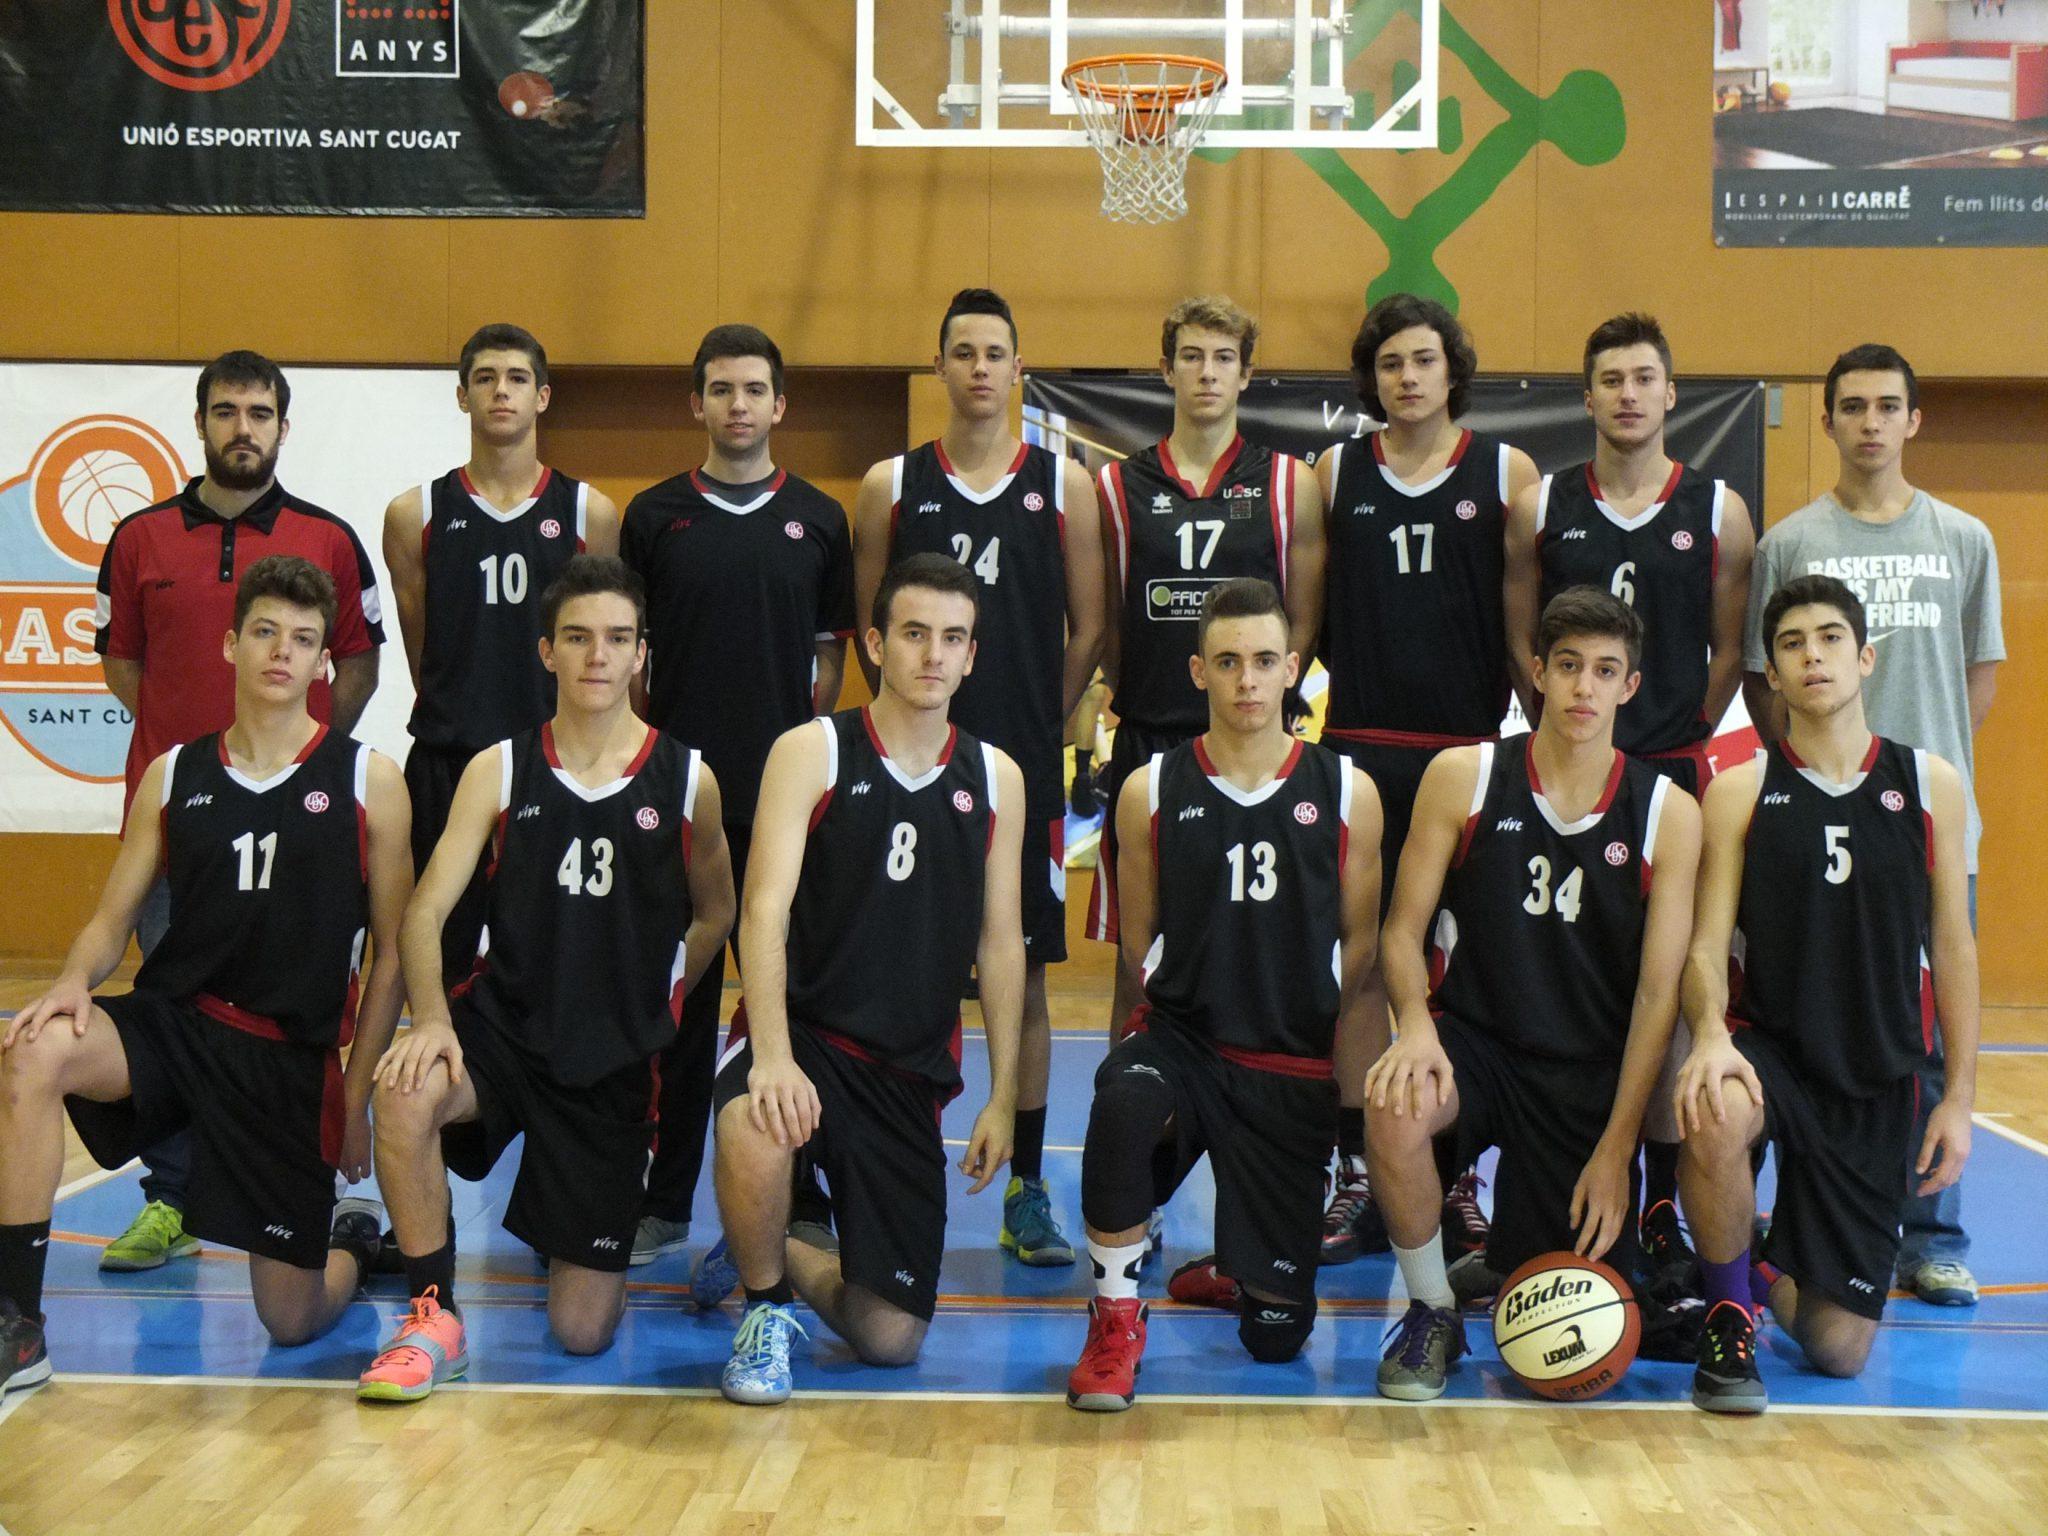 Júnior 2 Masc foto plantilla 2014-2015